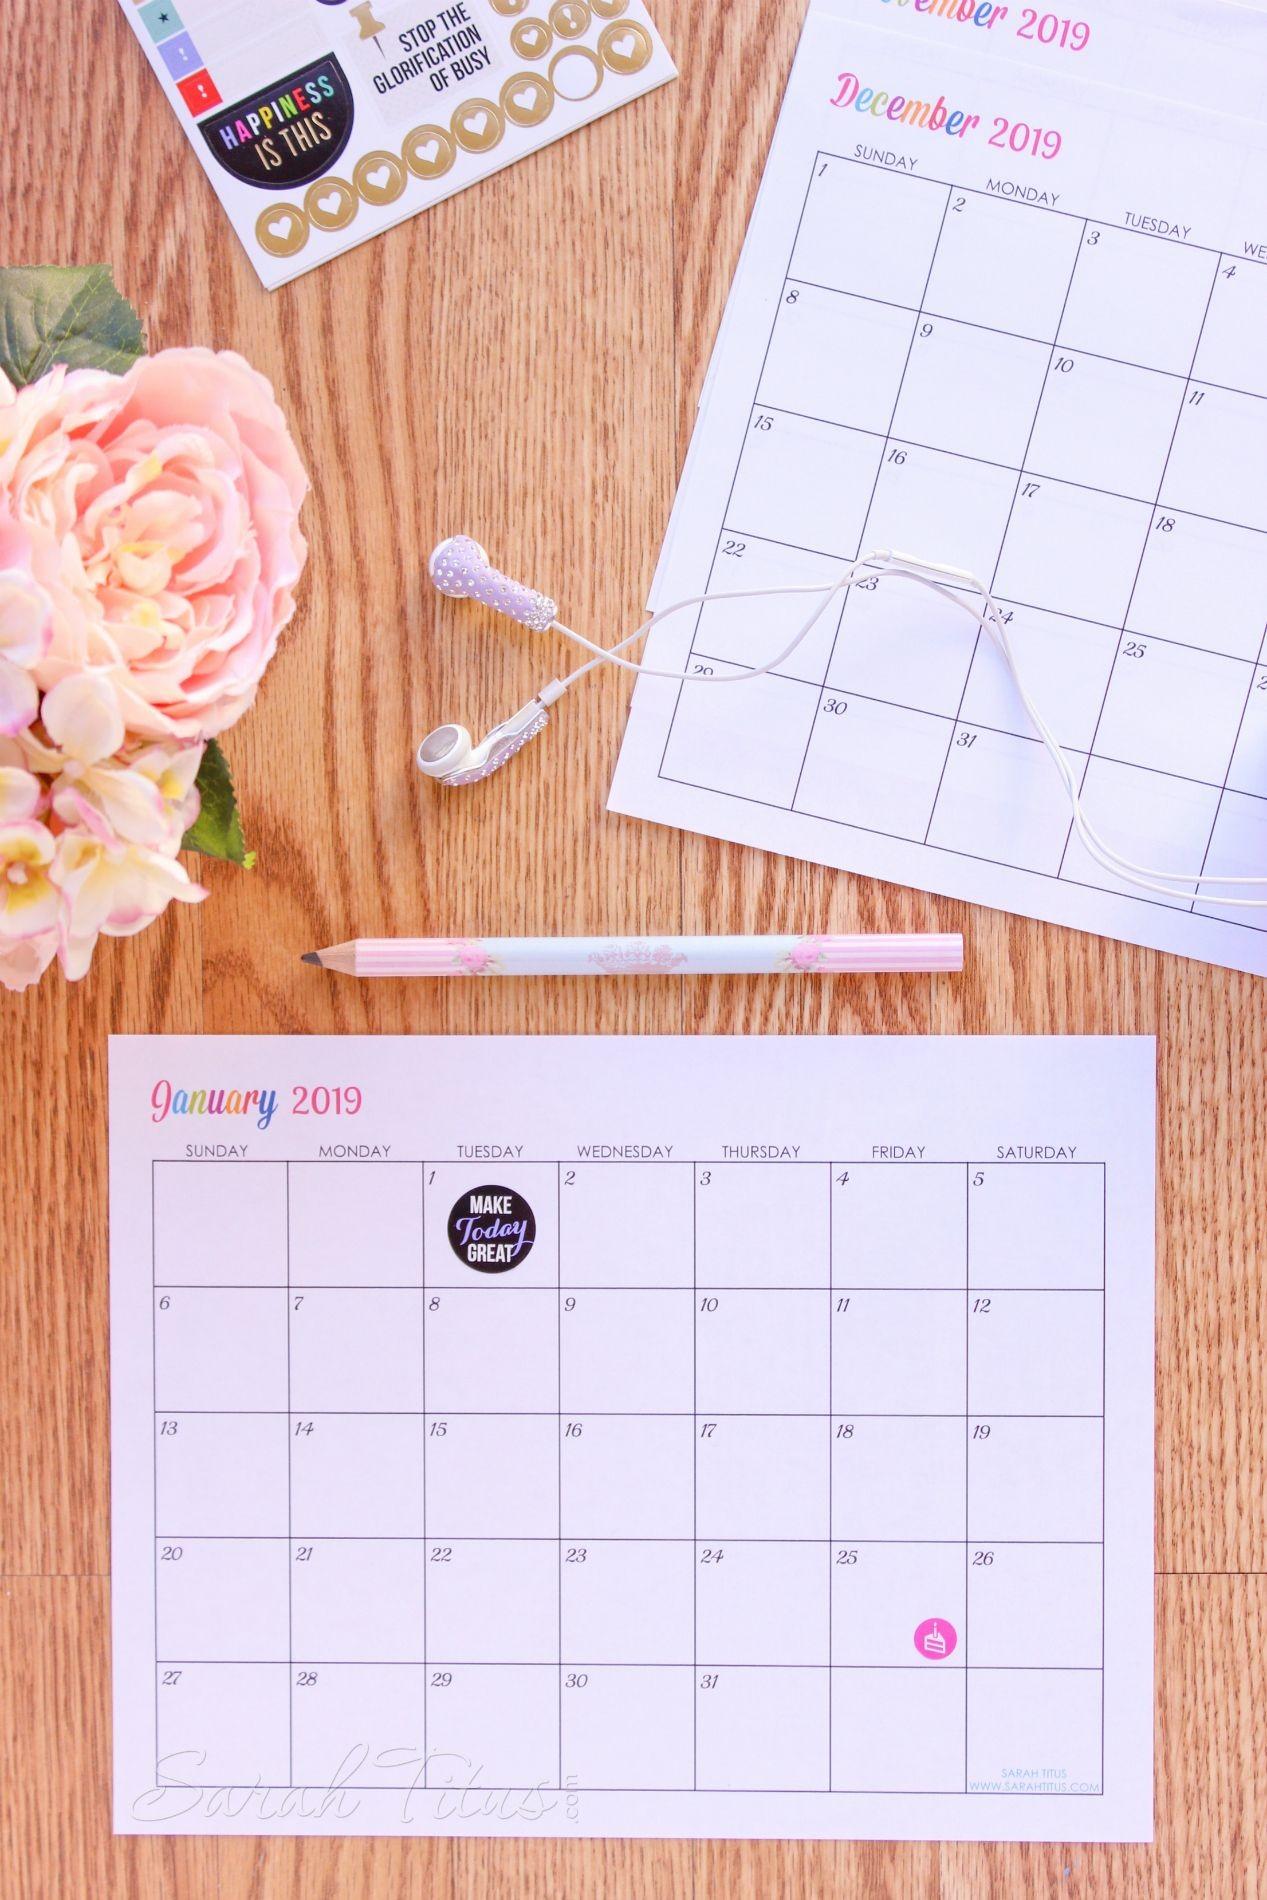 Daily Calendar Planner 2019 Actual Custom Editable Free Printable 2019 Calendars Of Daily Calendar Planner 2019 Más Actual Calendar Agenda 2017 Free Calendar Printables Kleoachfix – Fulltrunk